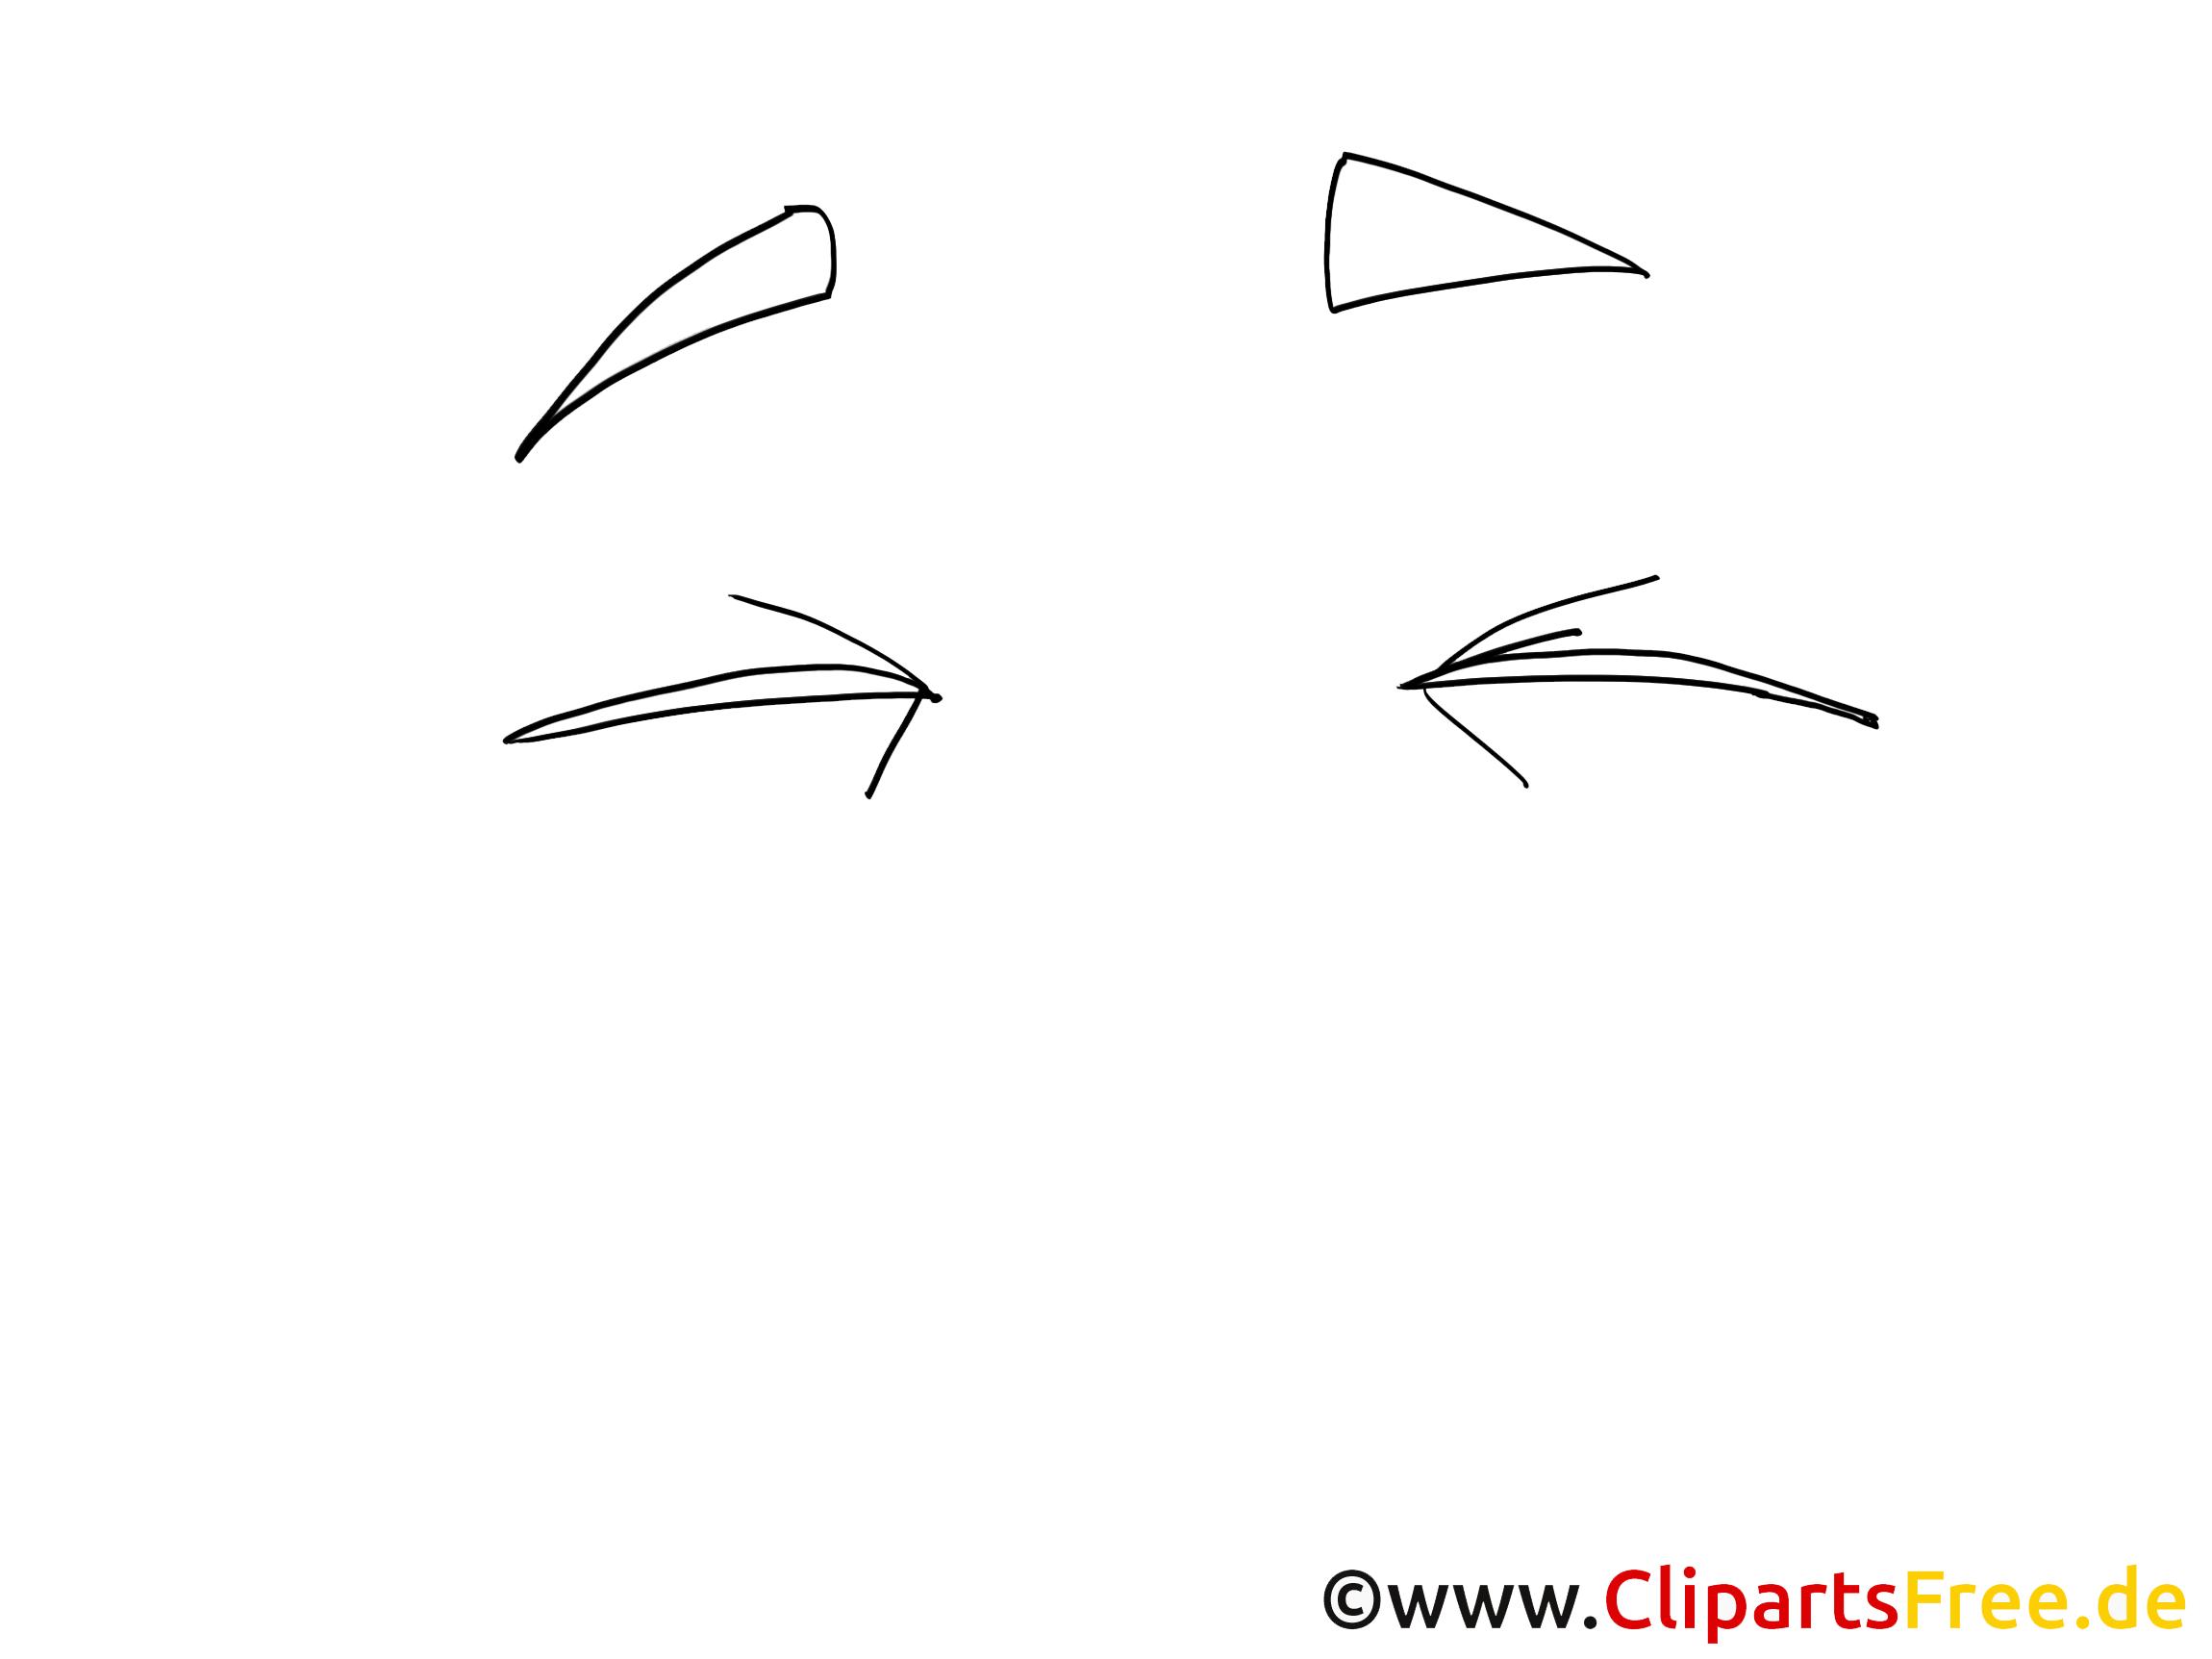 Fermés yeux dessins gratuits – Dessin clipart